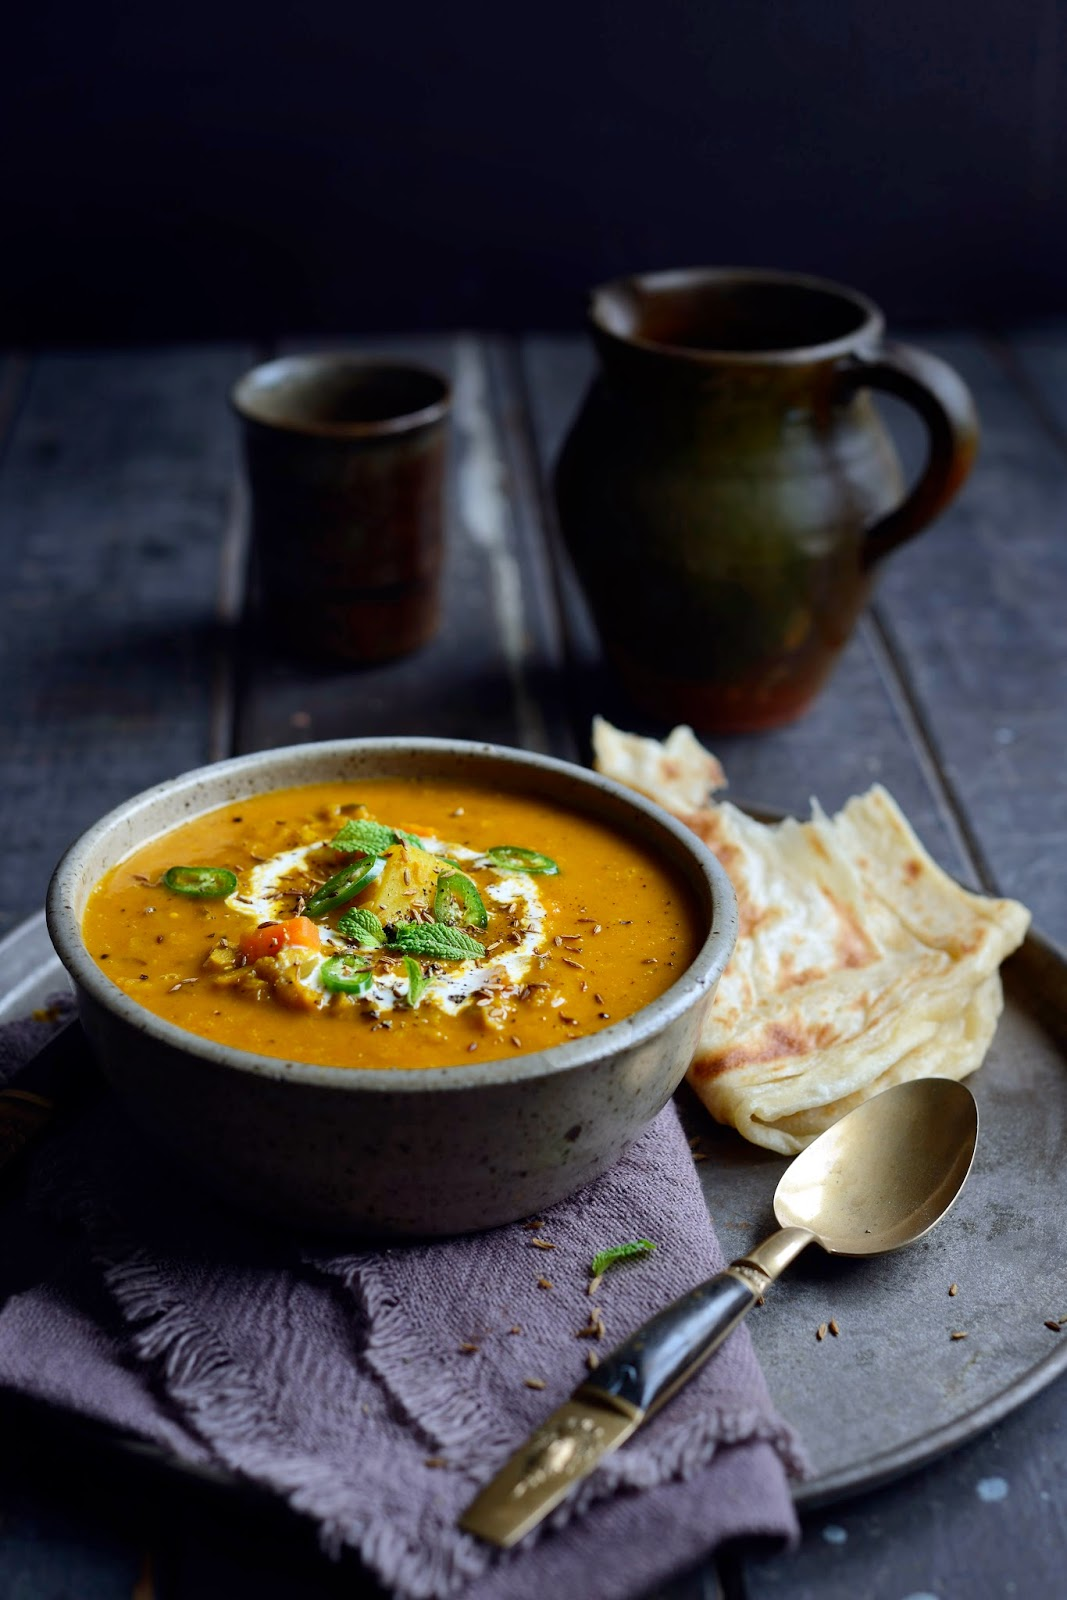 fragrant spiced Indian vegetable & lentil soup – Stuck in the kitchen